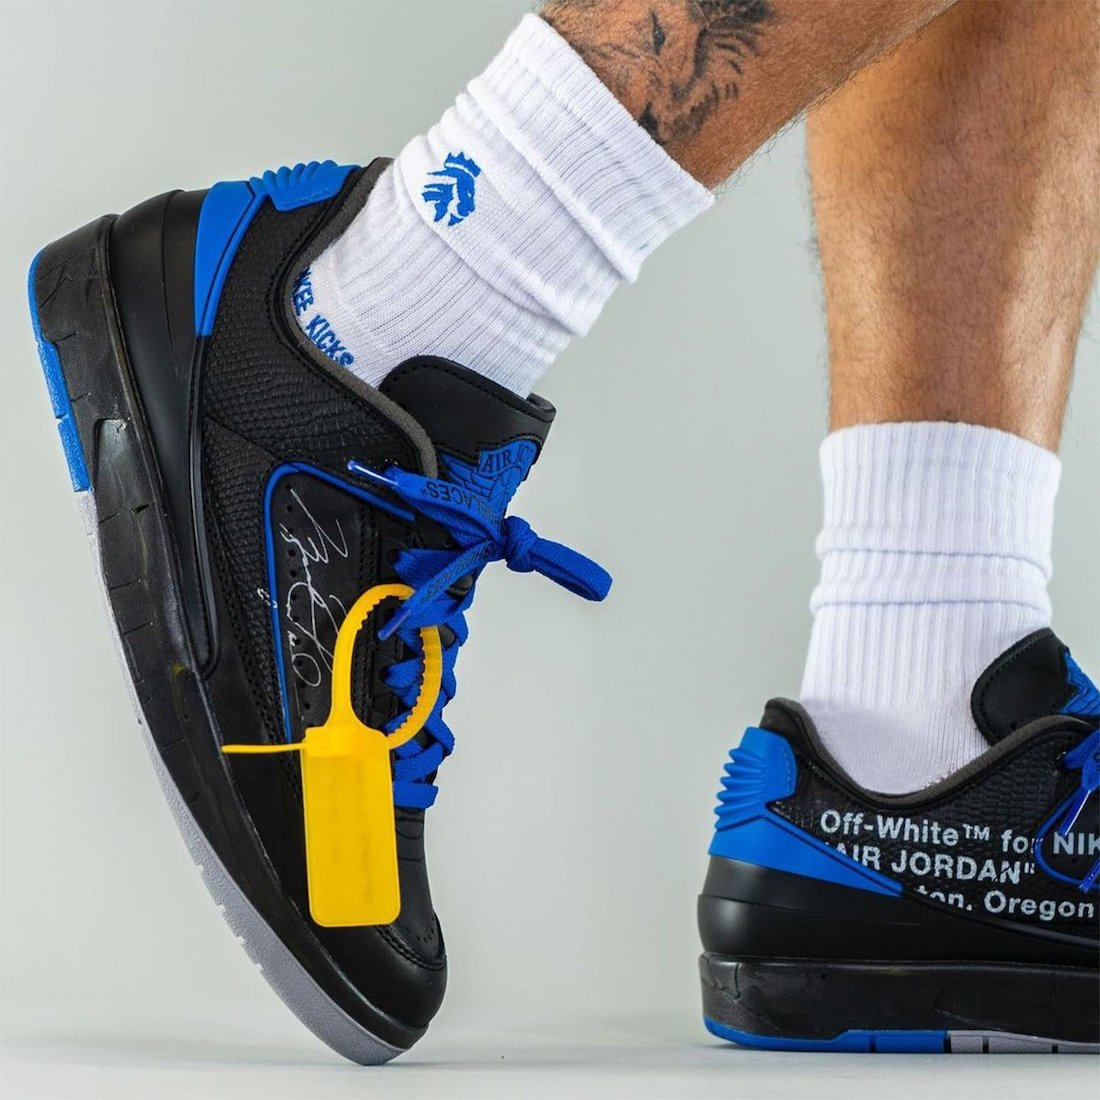 Off-White Air Jordan 2 Low Black Blue DJ4375-004 On-Feet